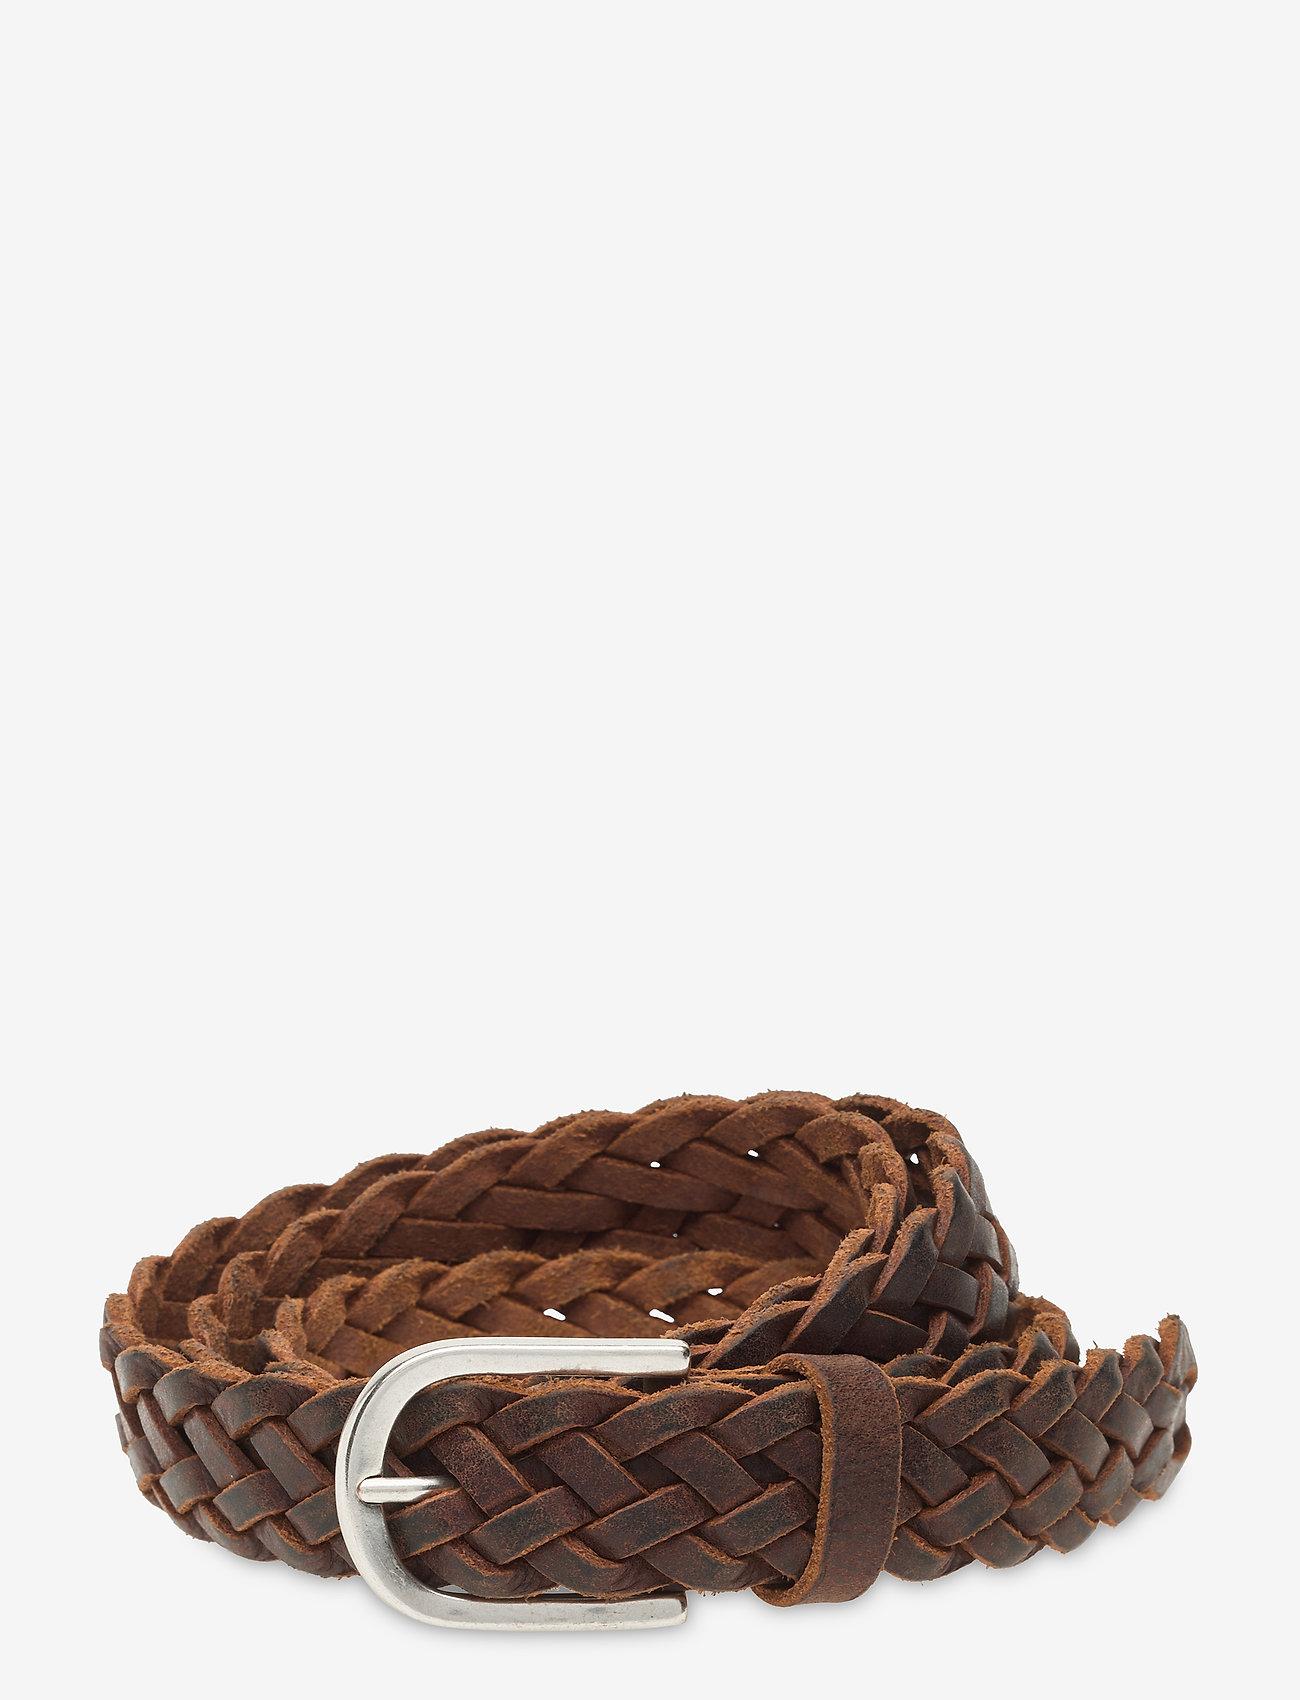 DEPECHE - Jeans belt - riemen - brown - 0